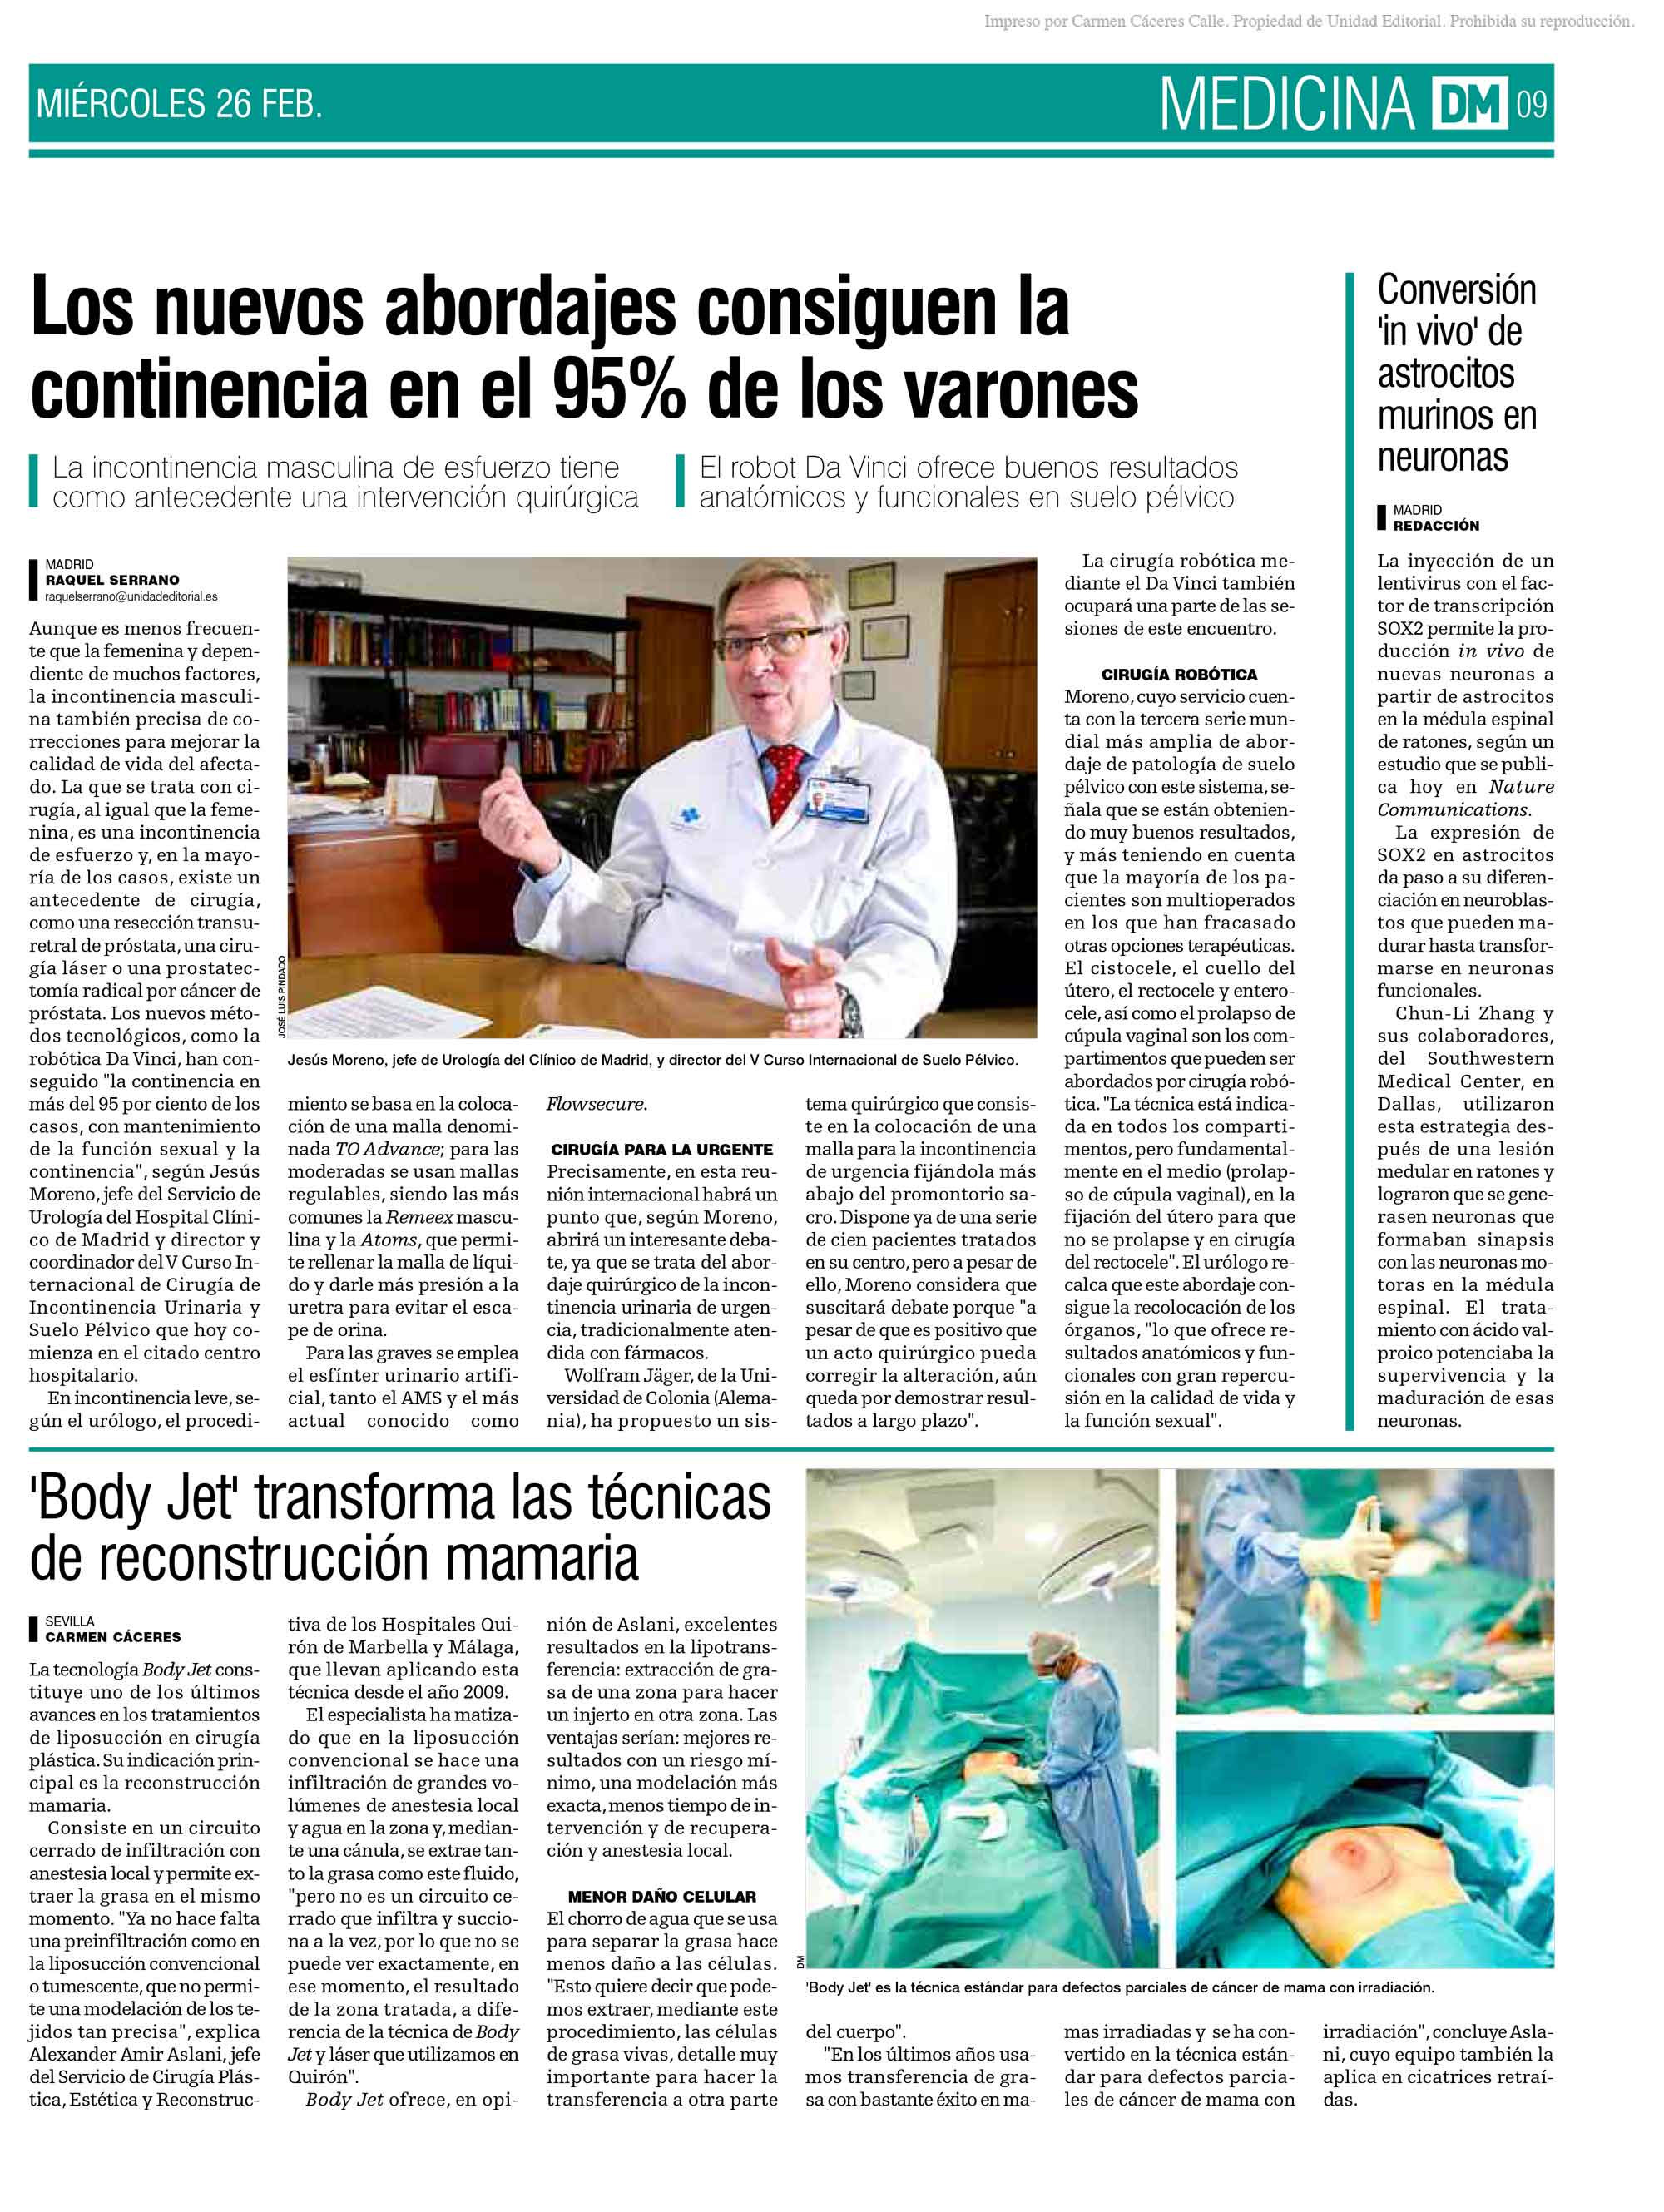 articulo-cirumed-clinic-medicina-dm-09